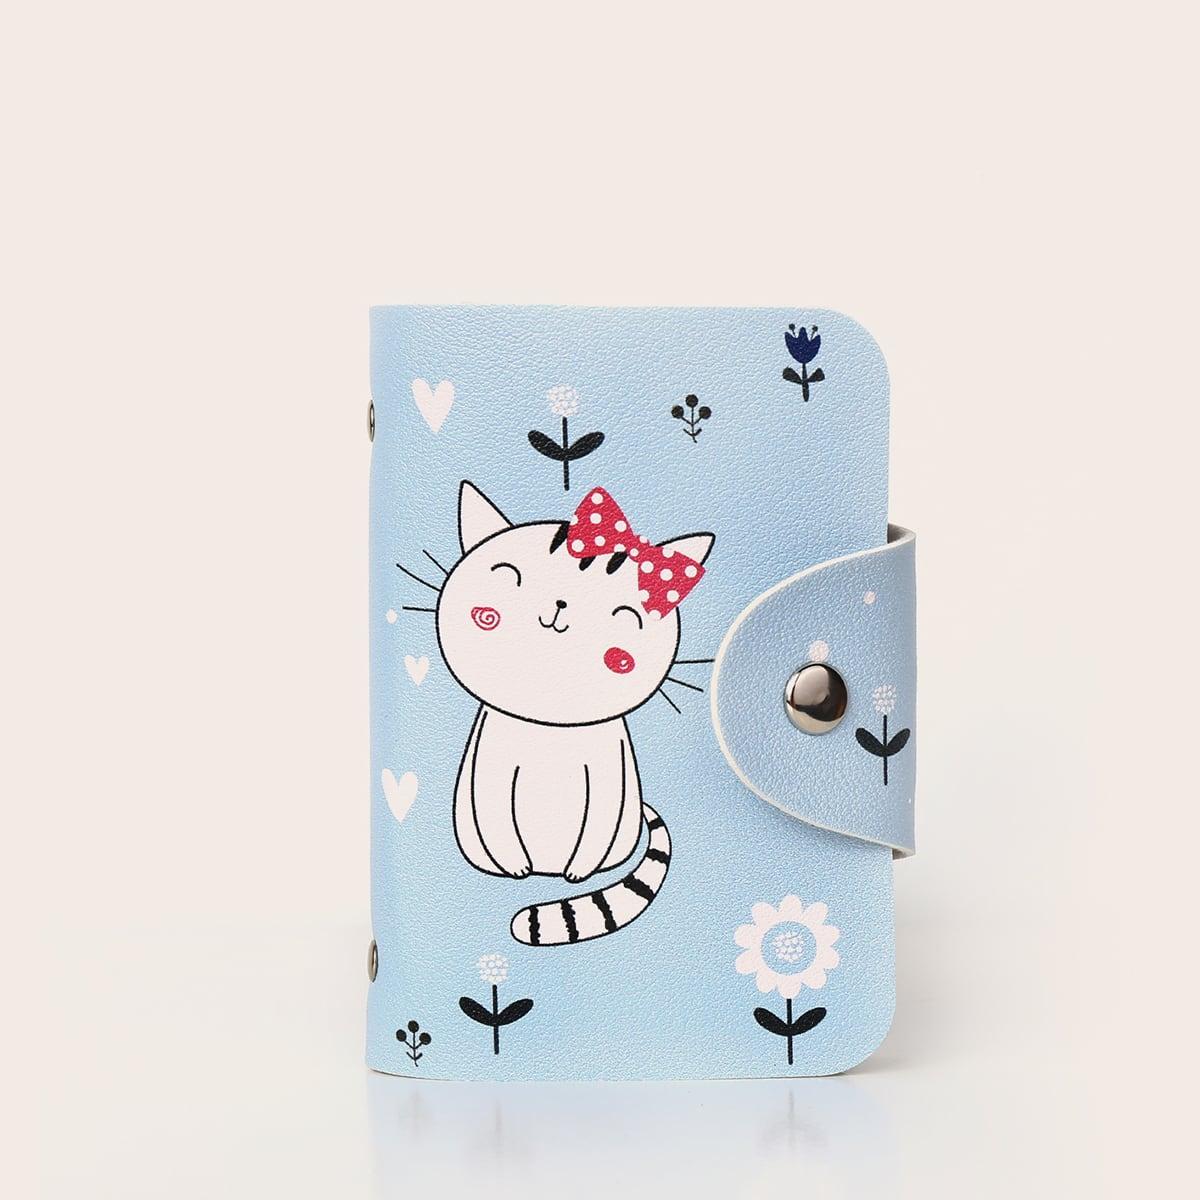 Snap Button Cartoon Graphic Card Holder